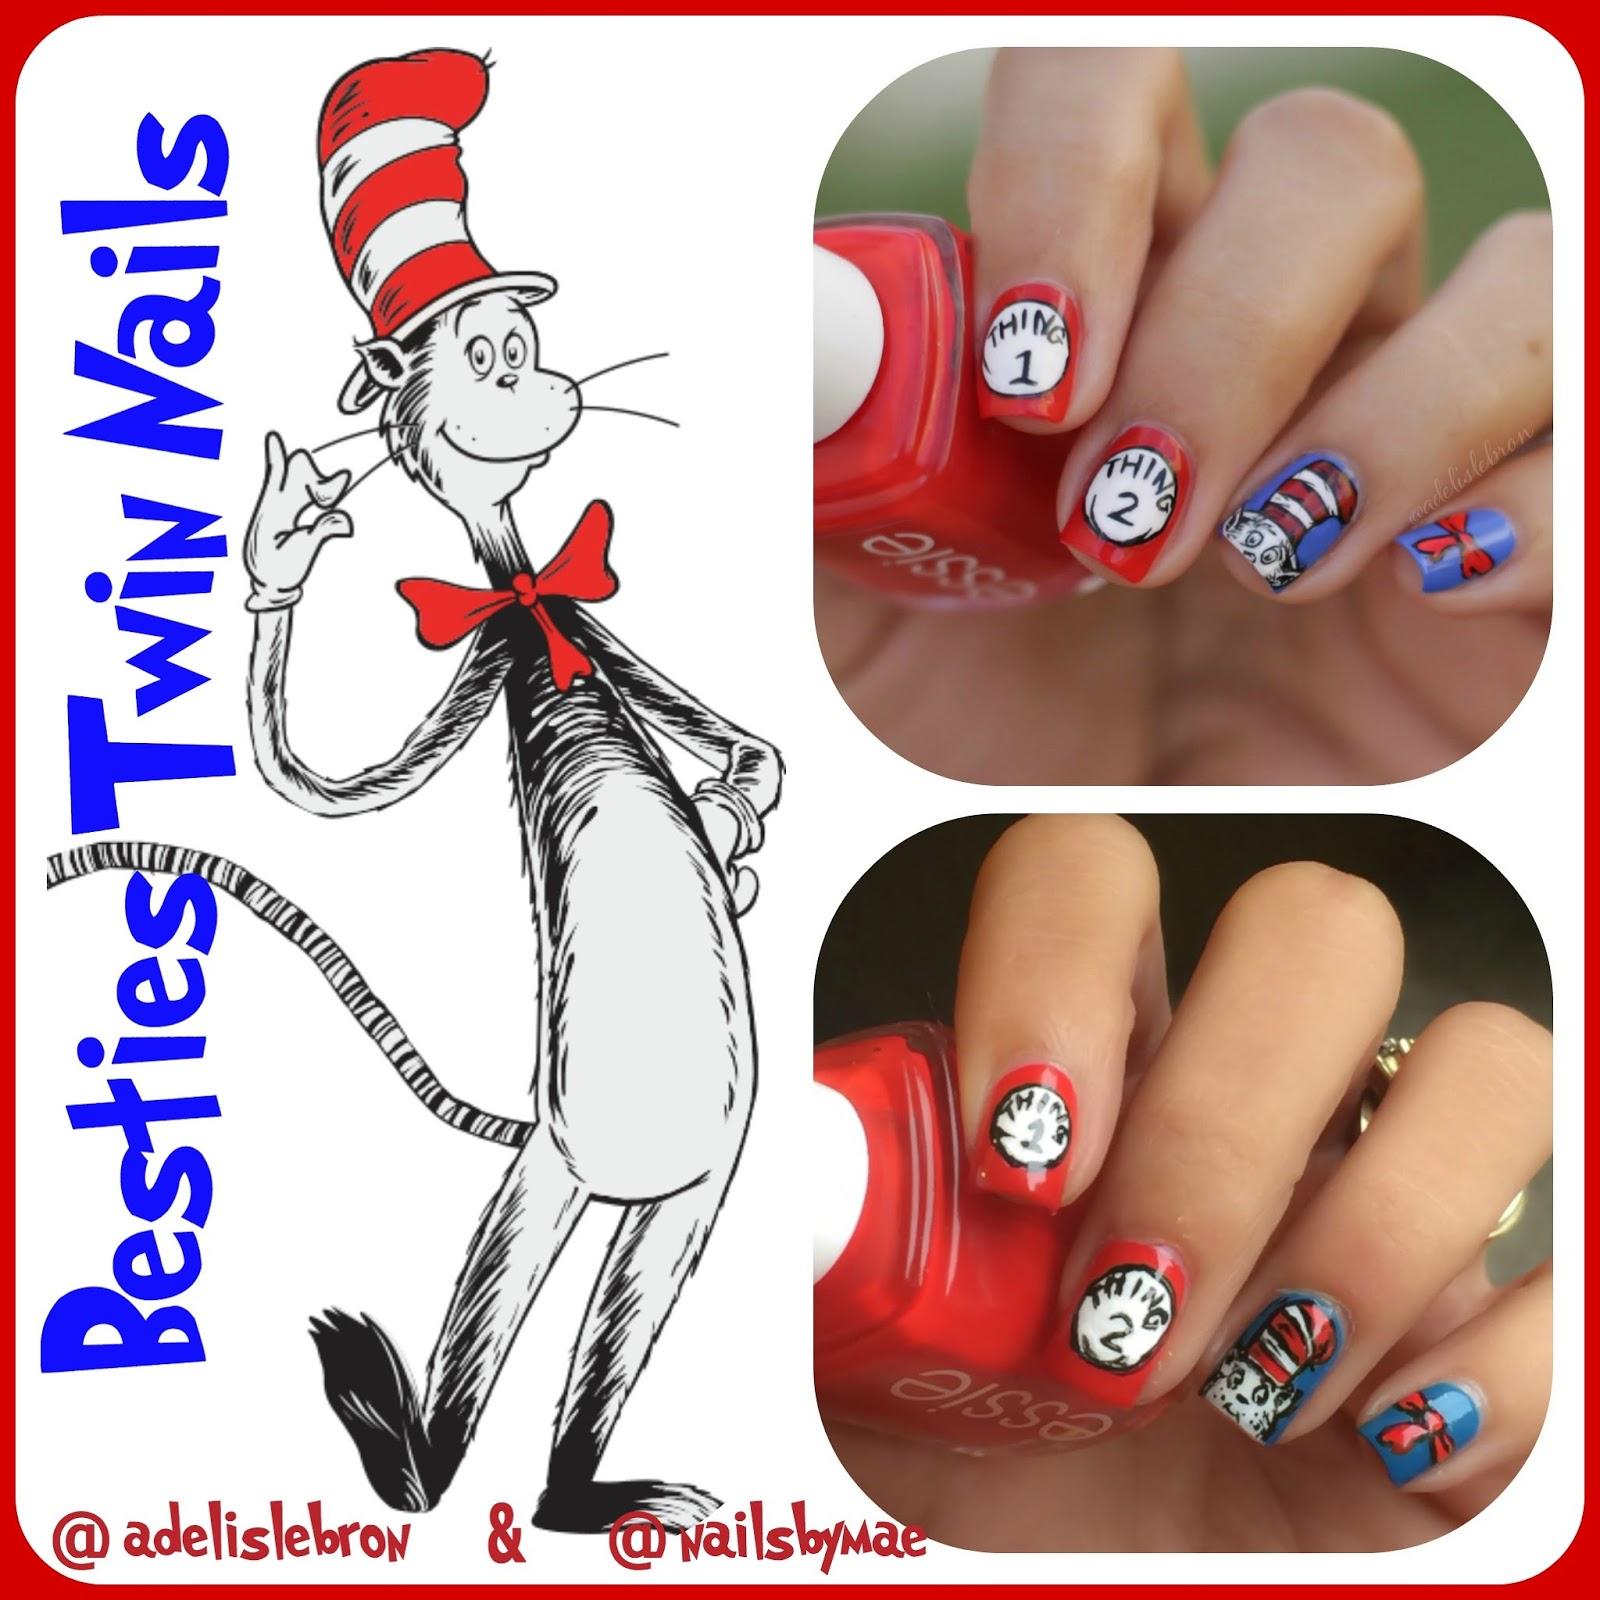 Adelis Lebron Nail Art October 2015